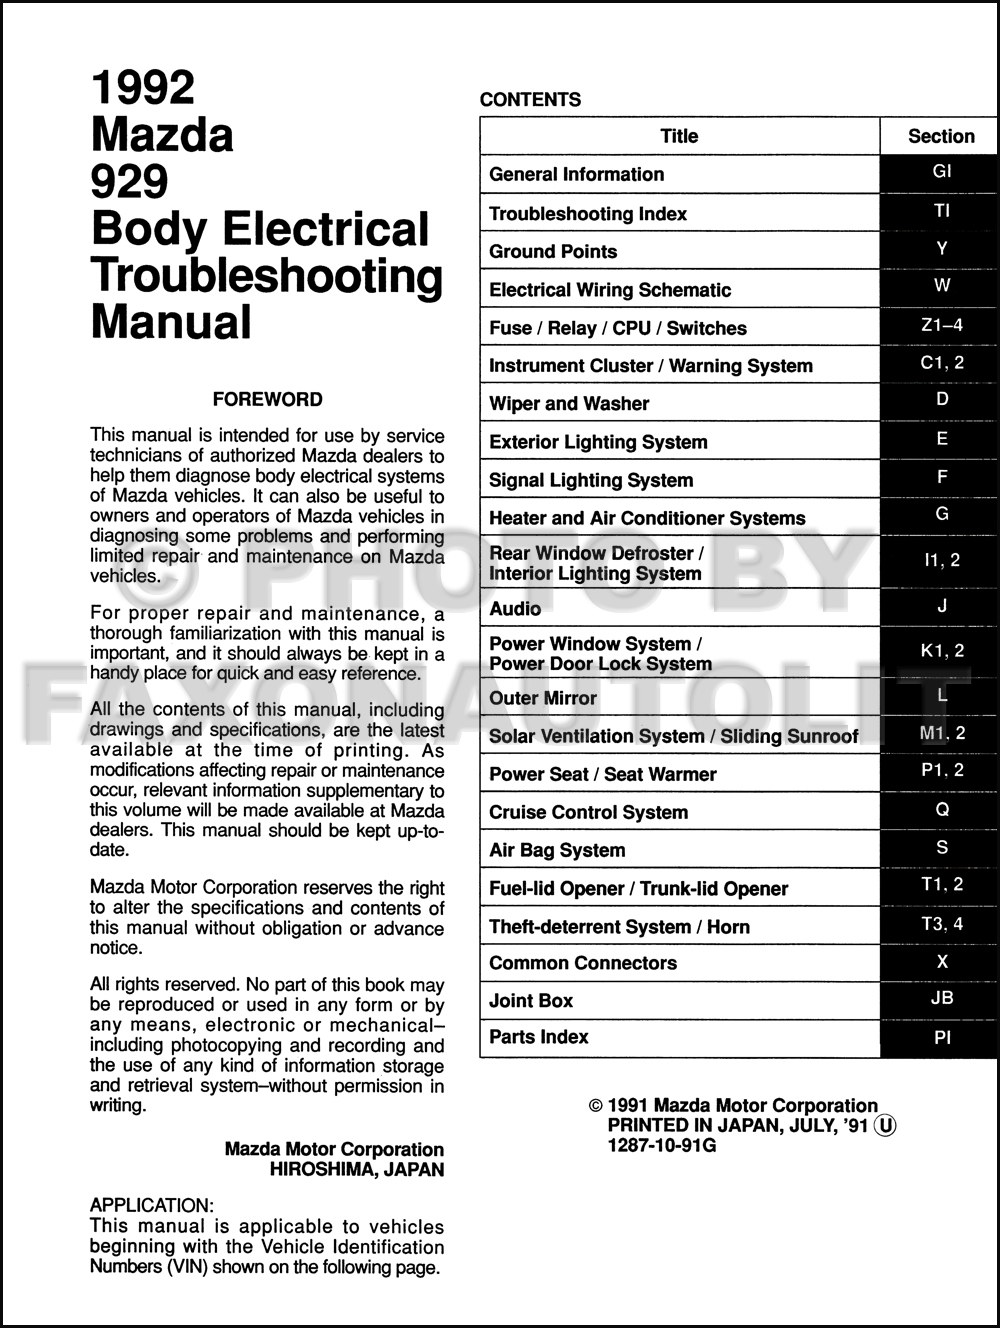 1992 mazda 929 body electrical troubleshooting manual original mazda 929 wiring diagram mazda xedos wiring diagram #11